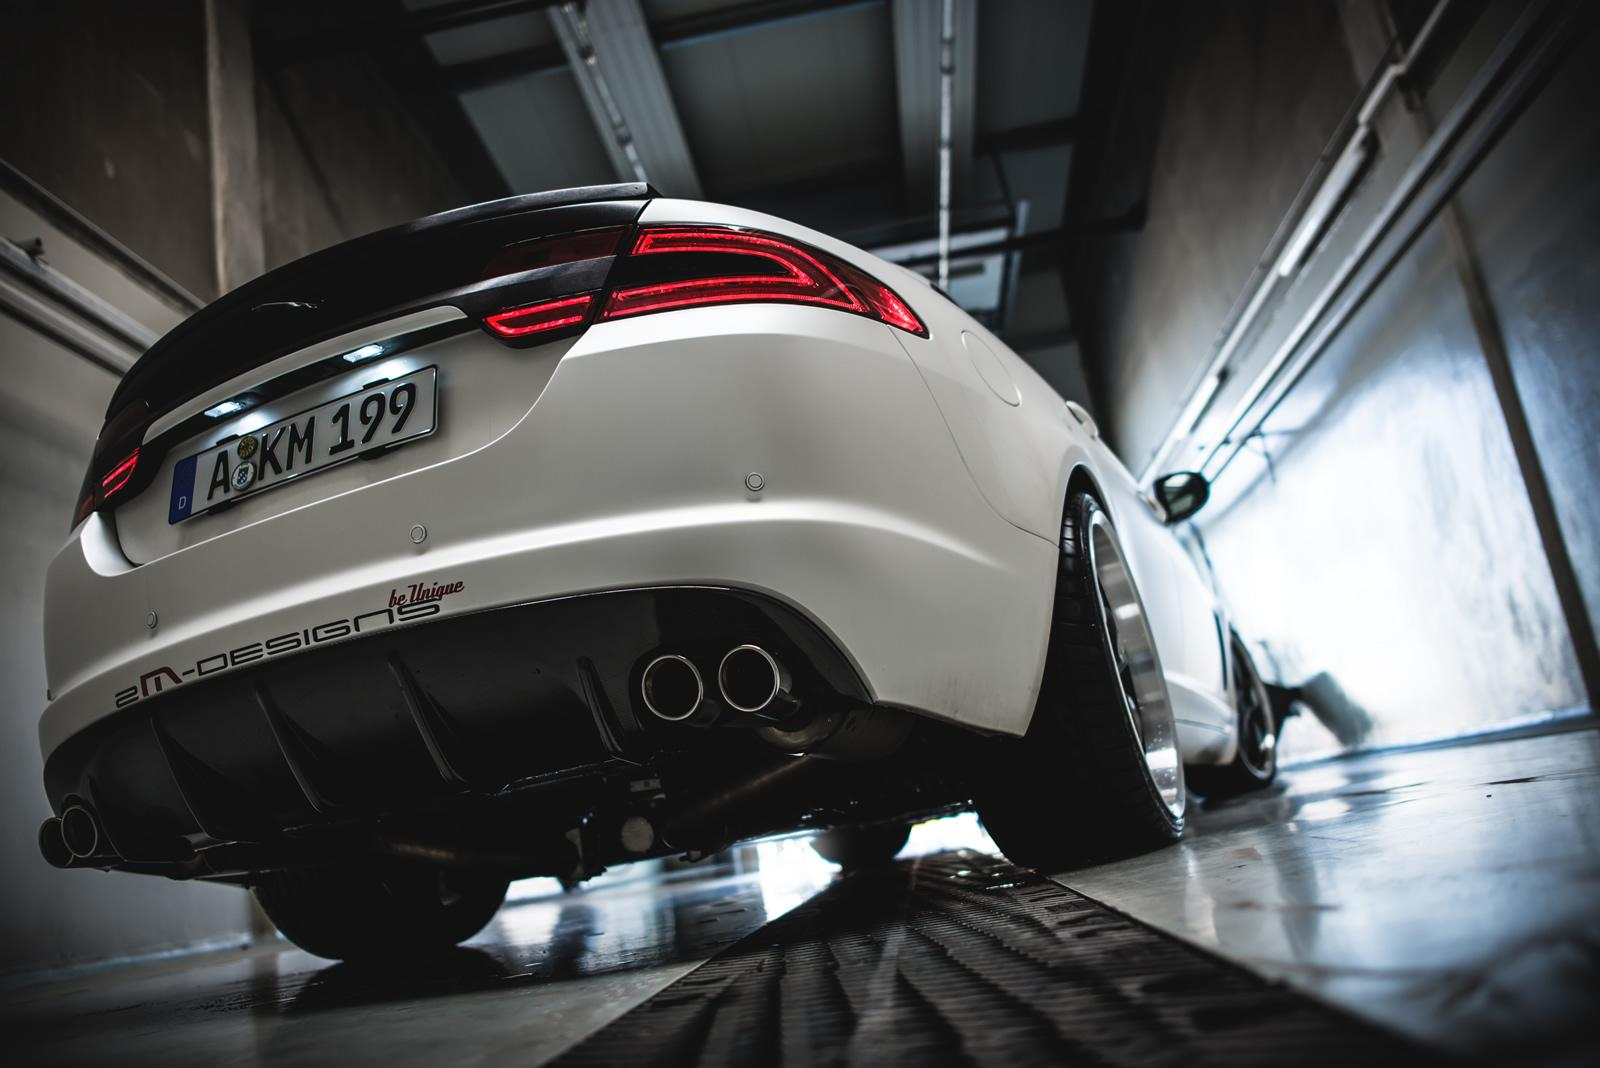 Jaguar Cars - Tuning: 2M-Designs tunes Jaguar XF3.0D S | 1600 x 1068 jpeg 126kB